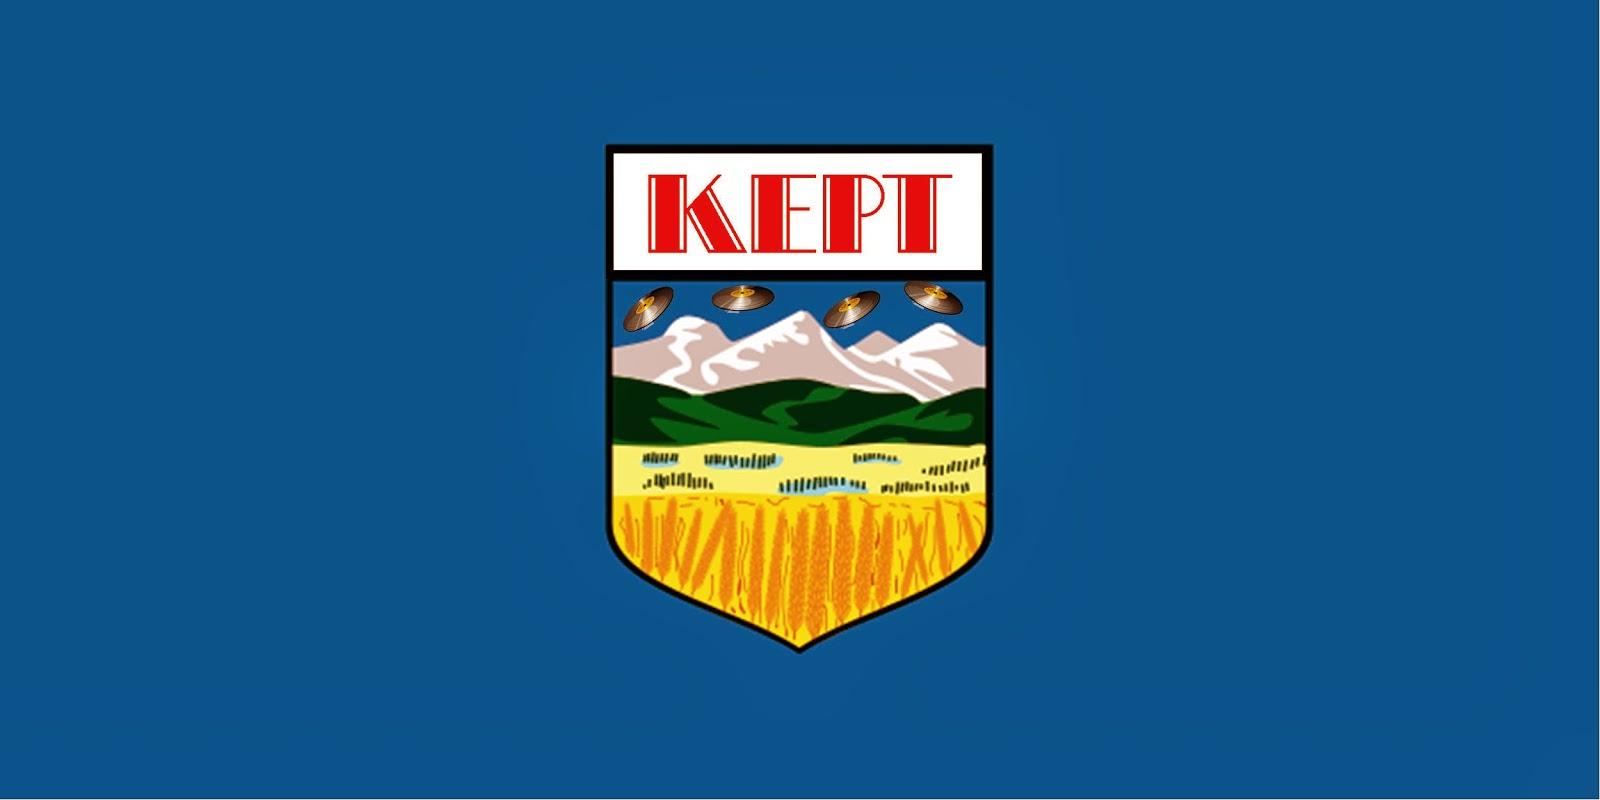 http://keptrecords.bigcartel.com/